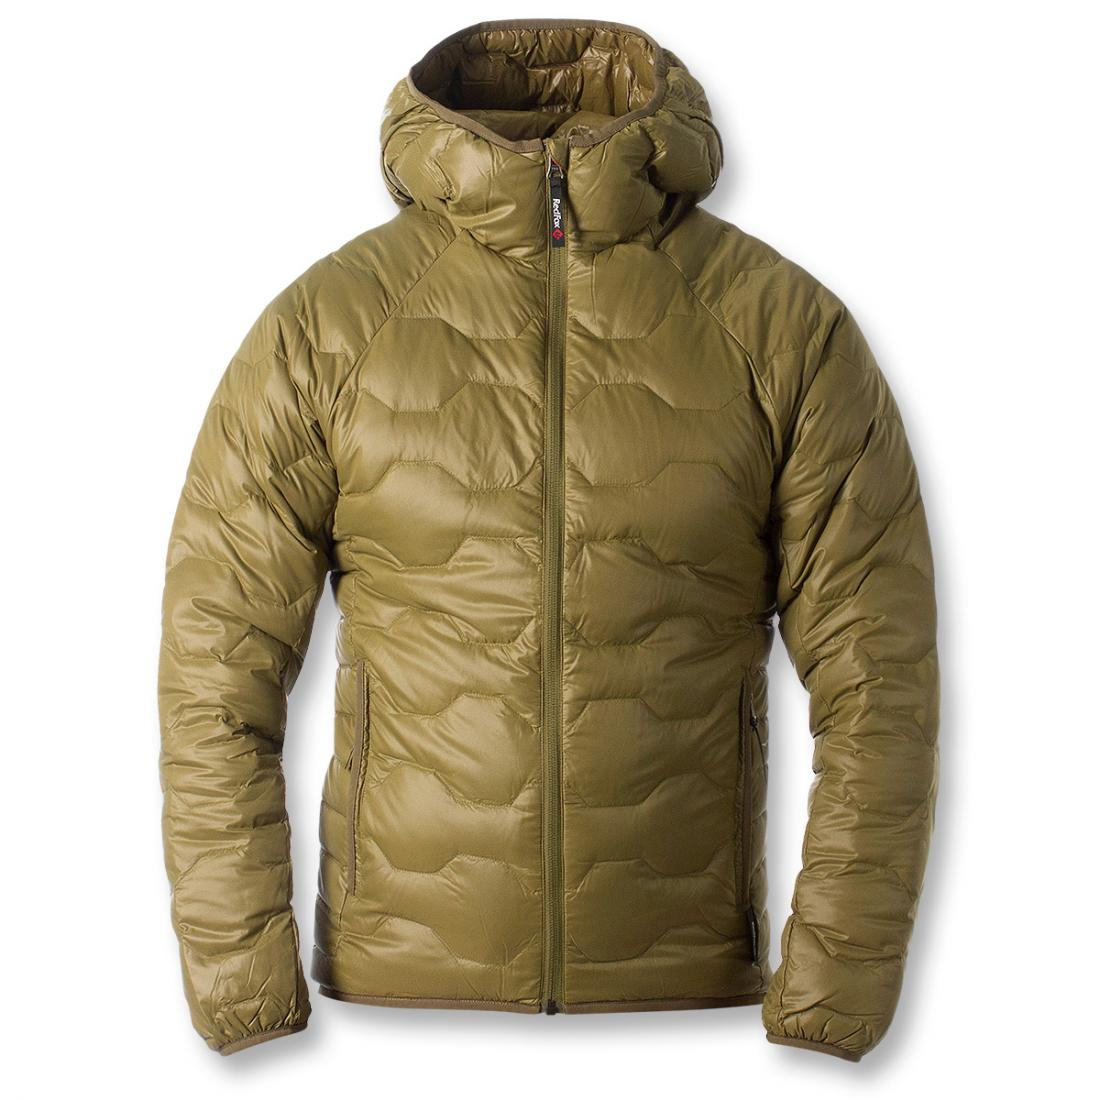 Куртка пуховая Belite III МужскаяКуртки<br><br><br>Цвет: Зеленый<br>Размер: 50